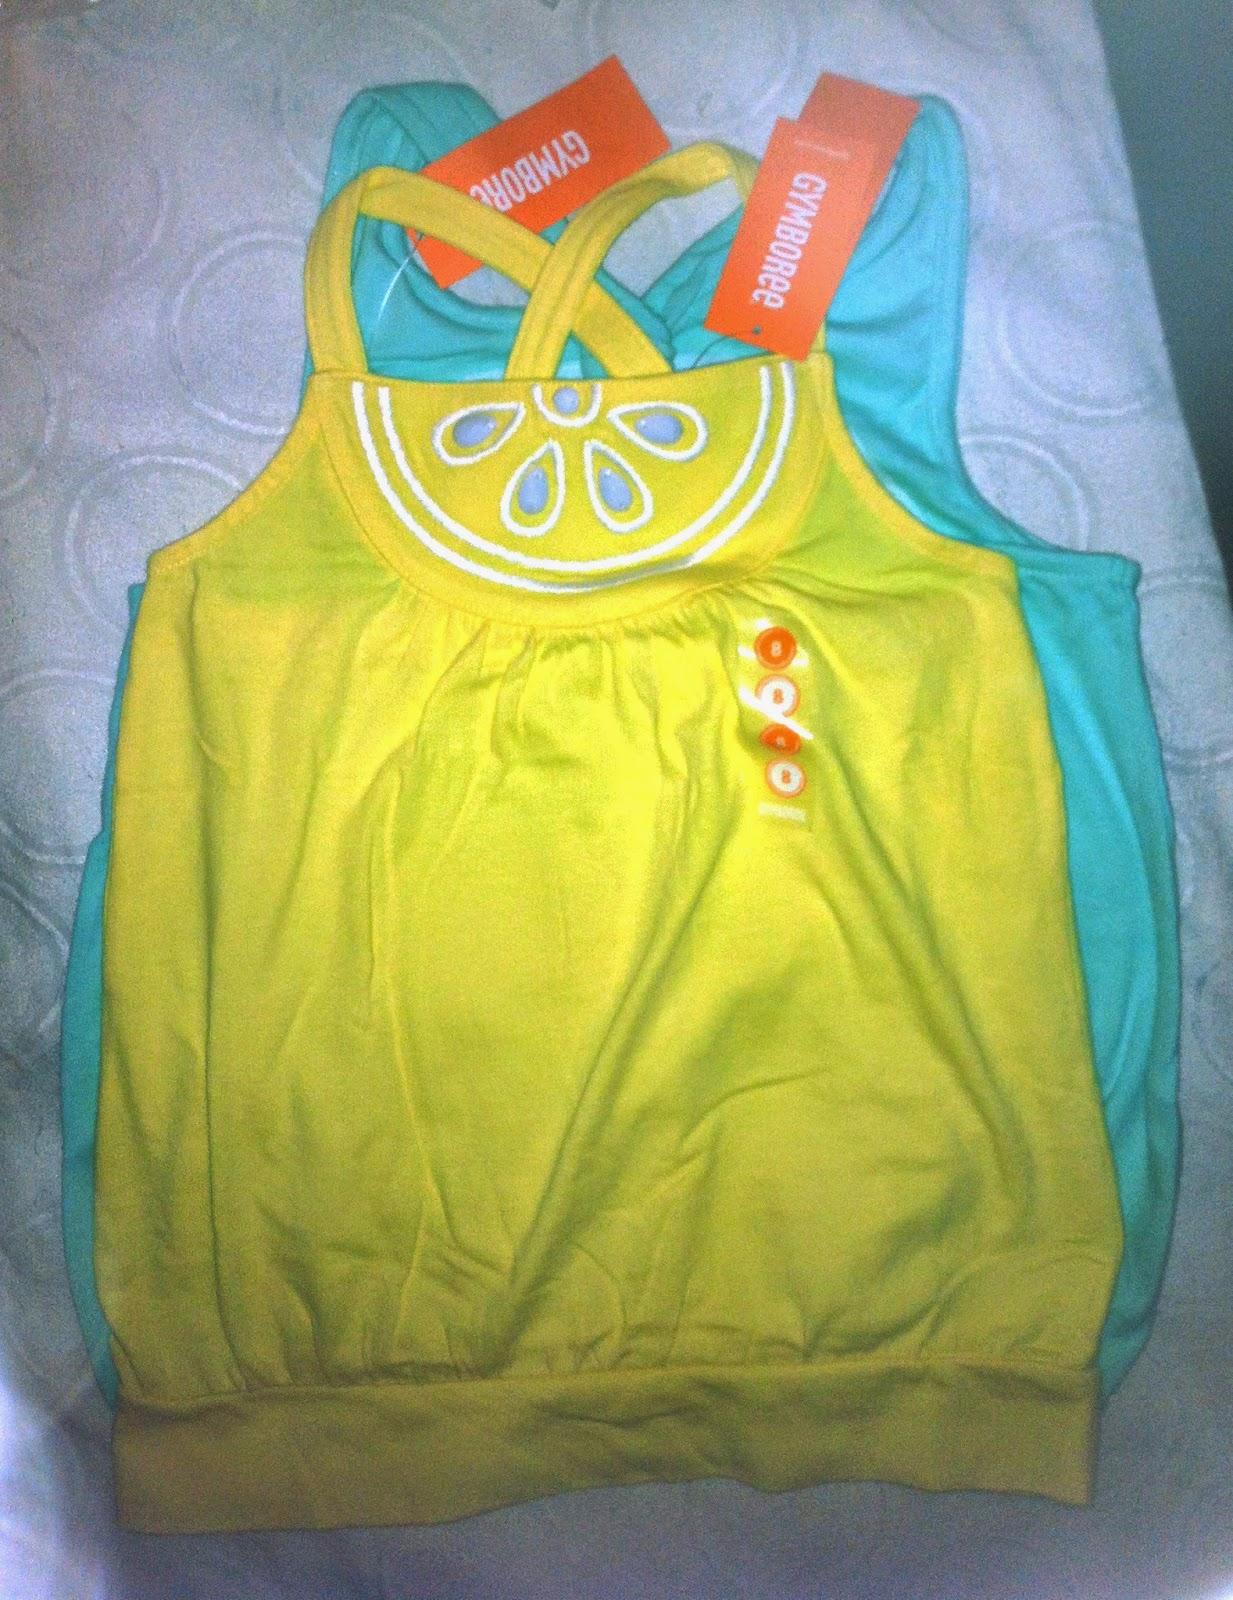 Baby & Toddler Clothing Nuovo Gymboree Blu Tartaruga Sole Stampa Da Infilare Pantaloncini Taglia 2t Clothing, Shoes & Accessories